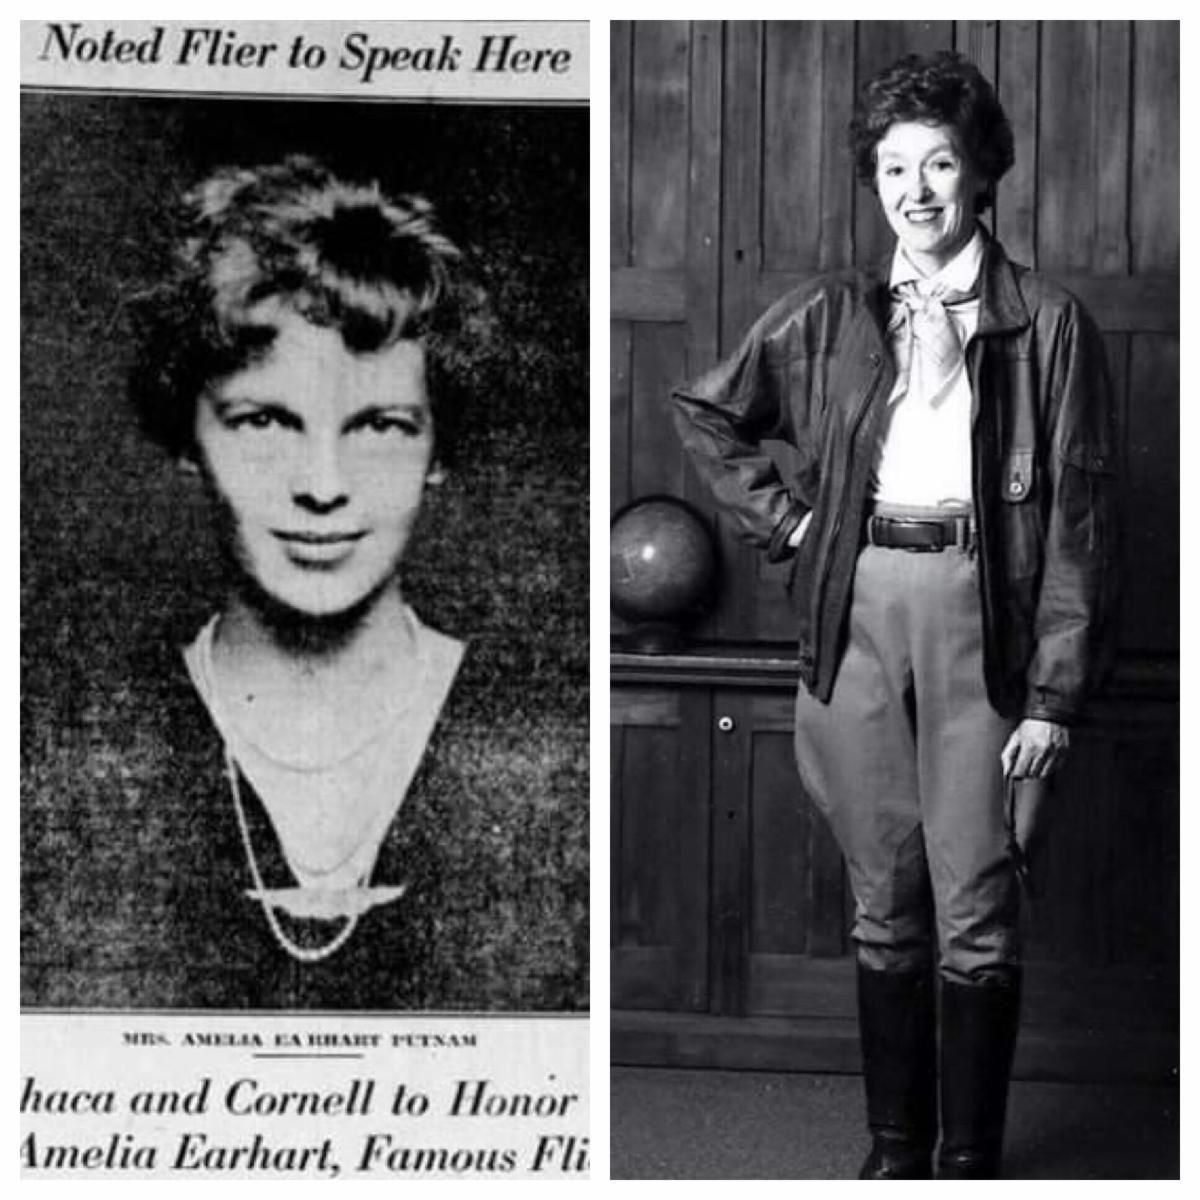 Photo of Amelia Earhart and photo of Eleanor Stearns as Amelia Earhart